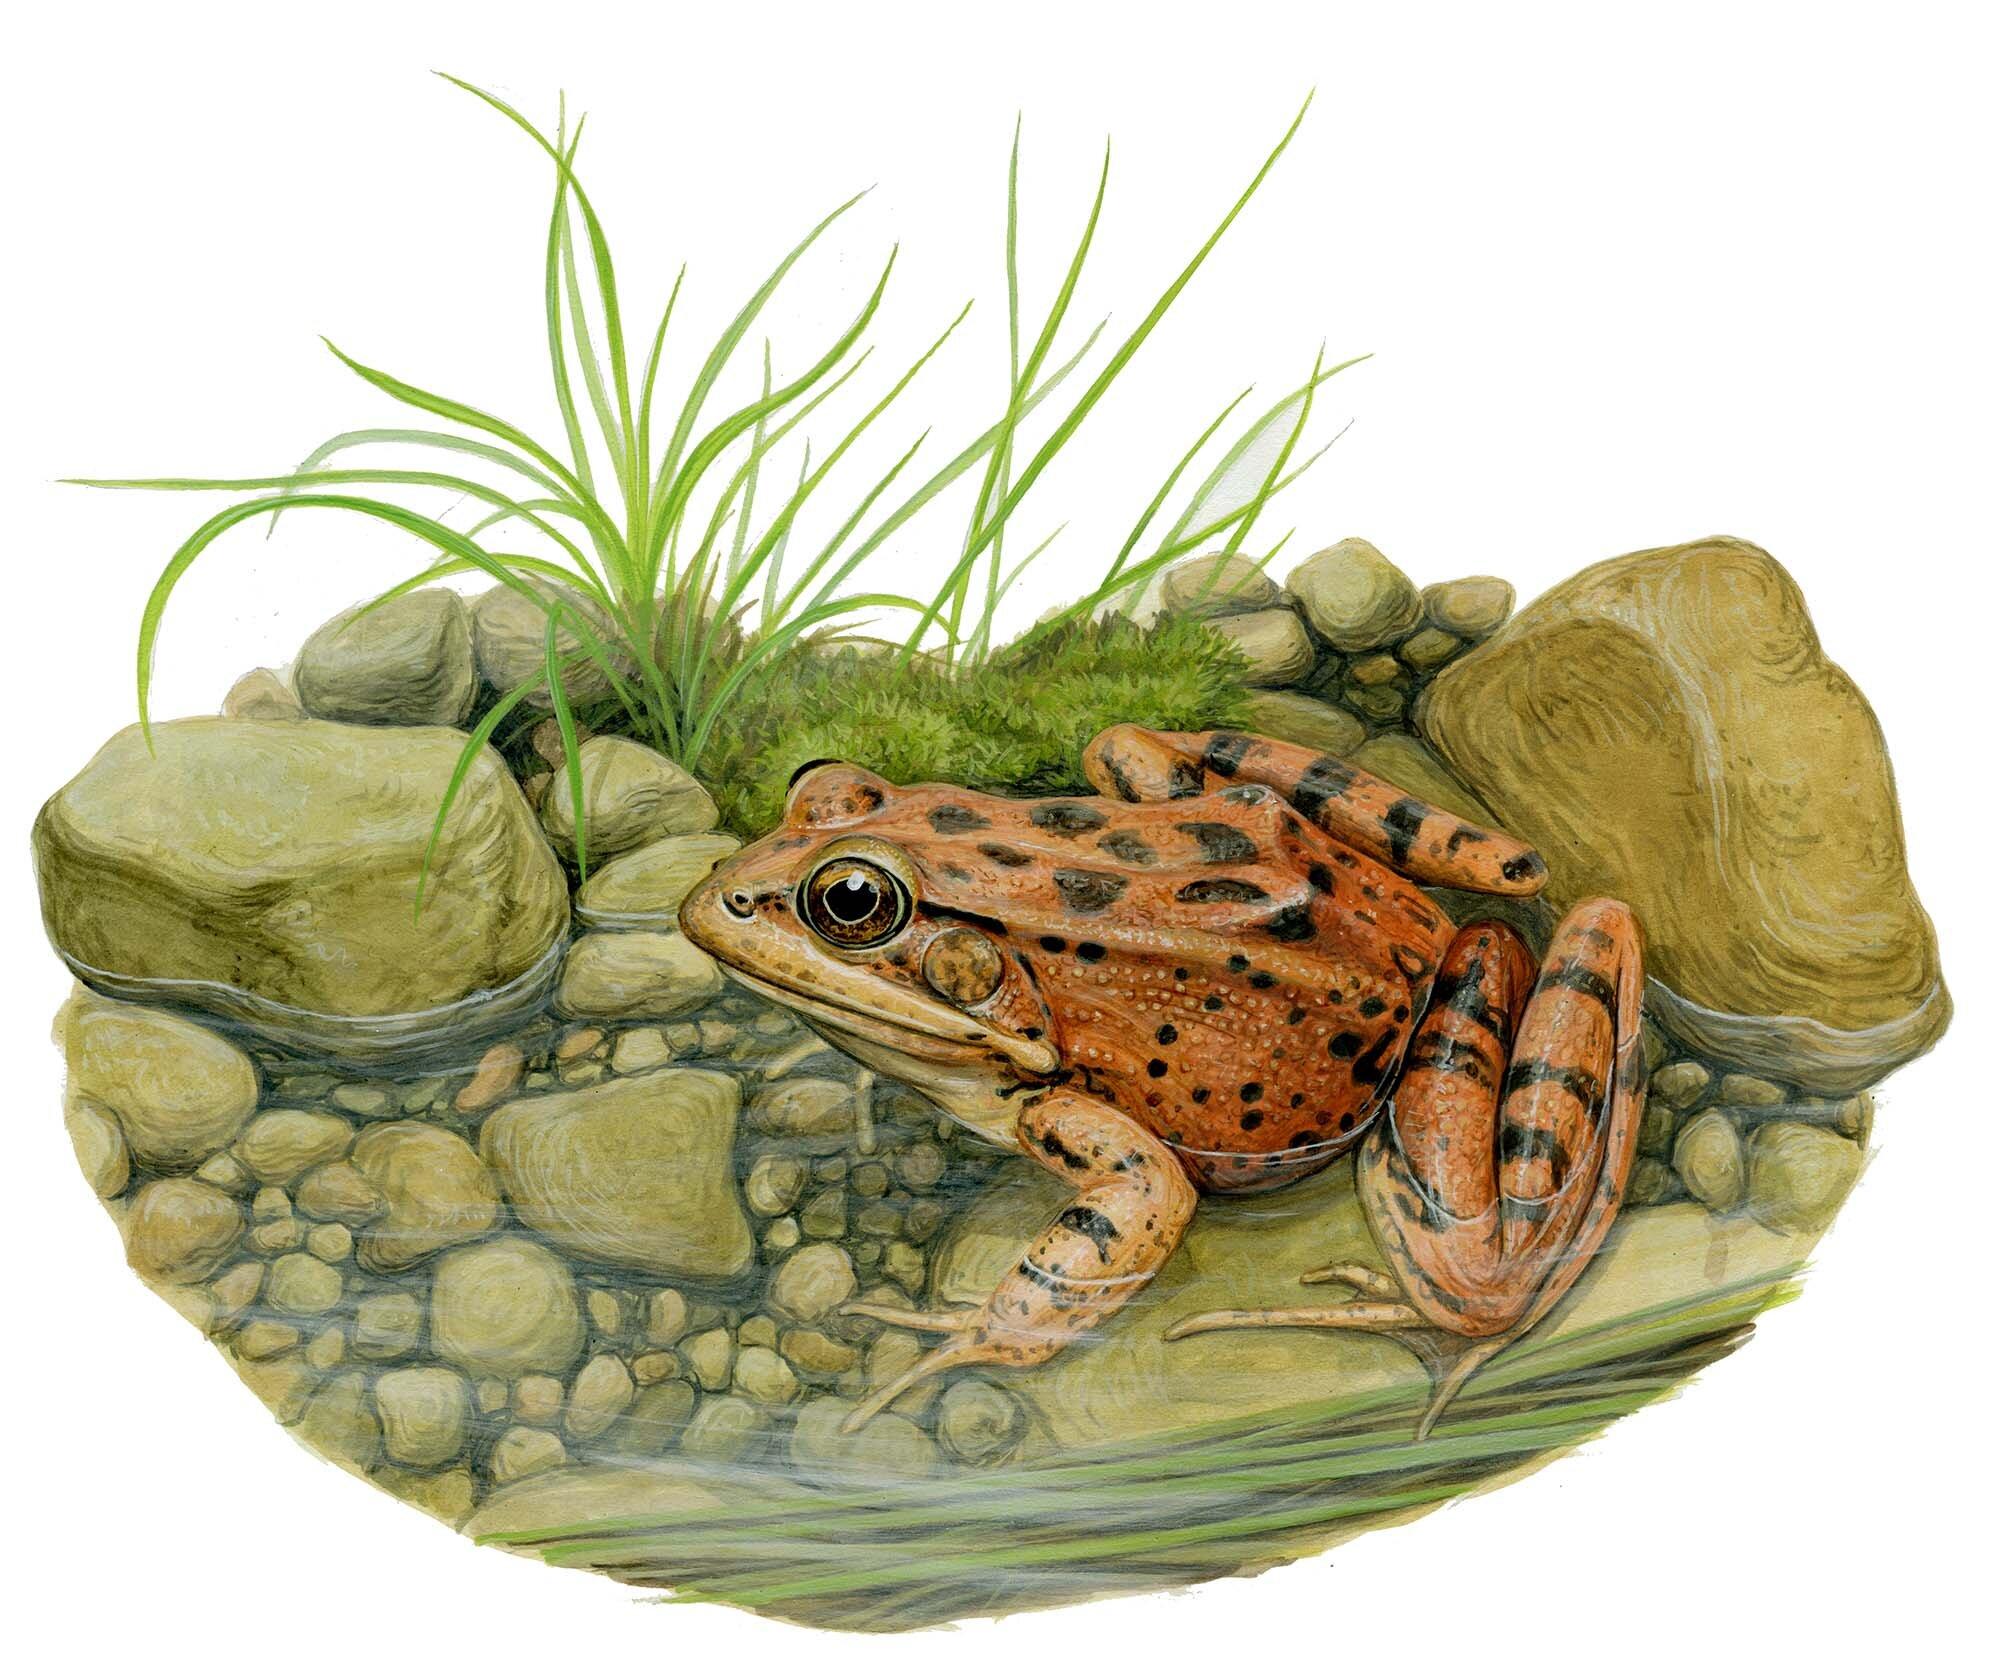 California Red-Legged Frog